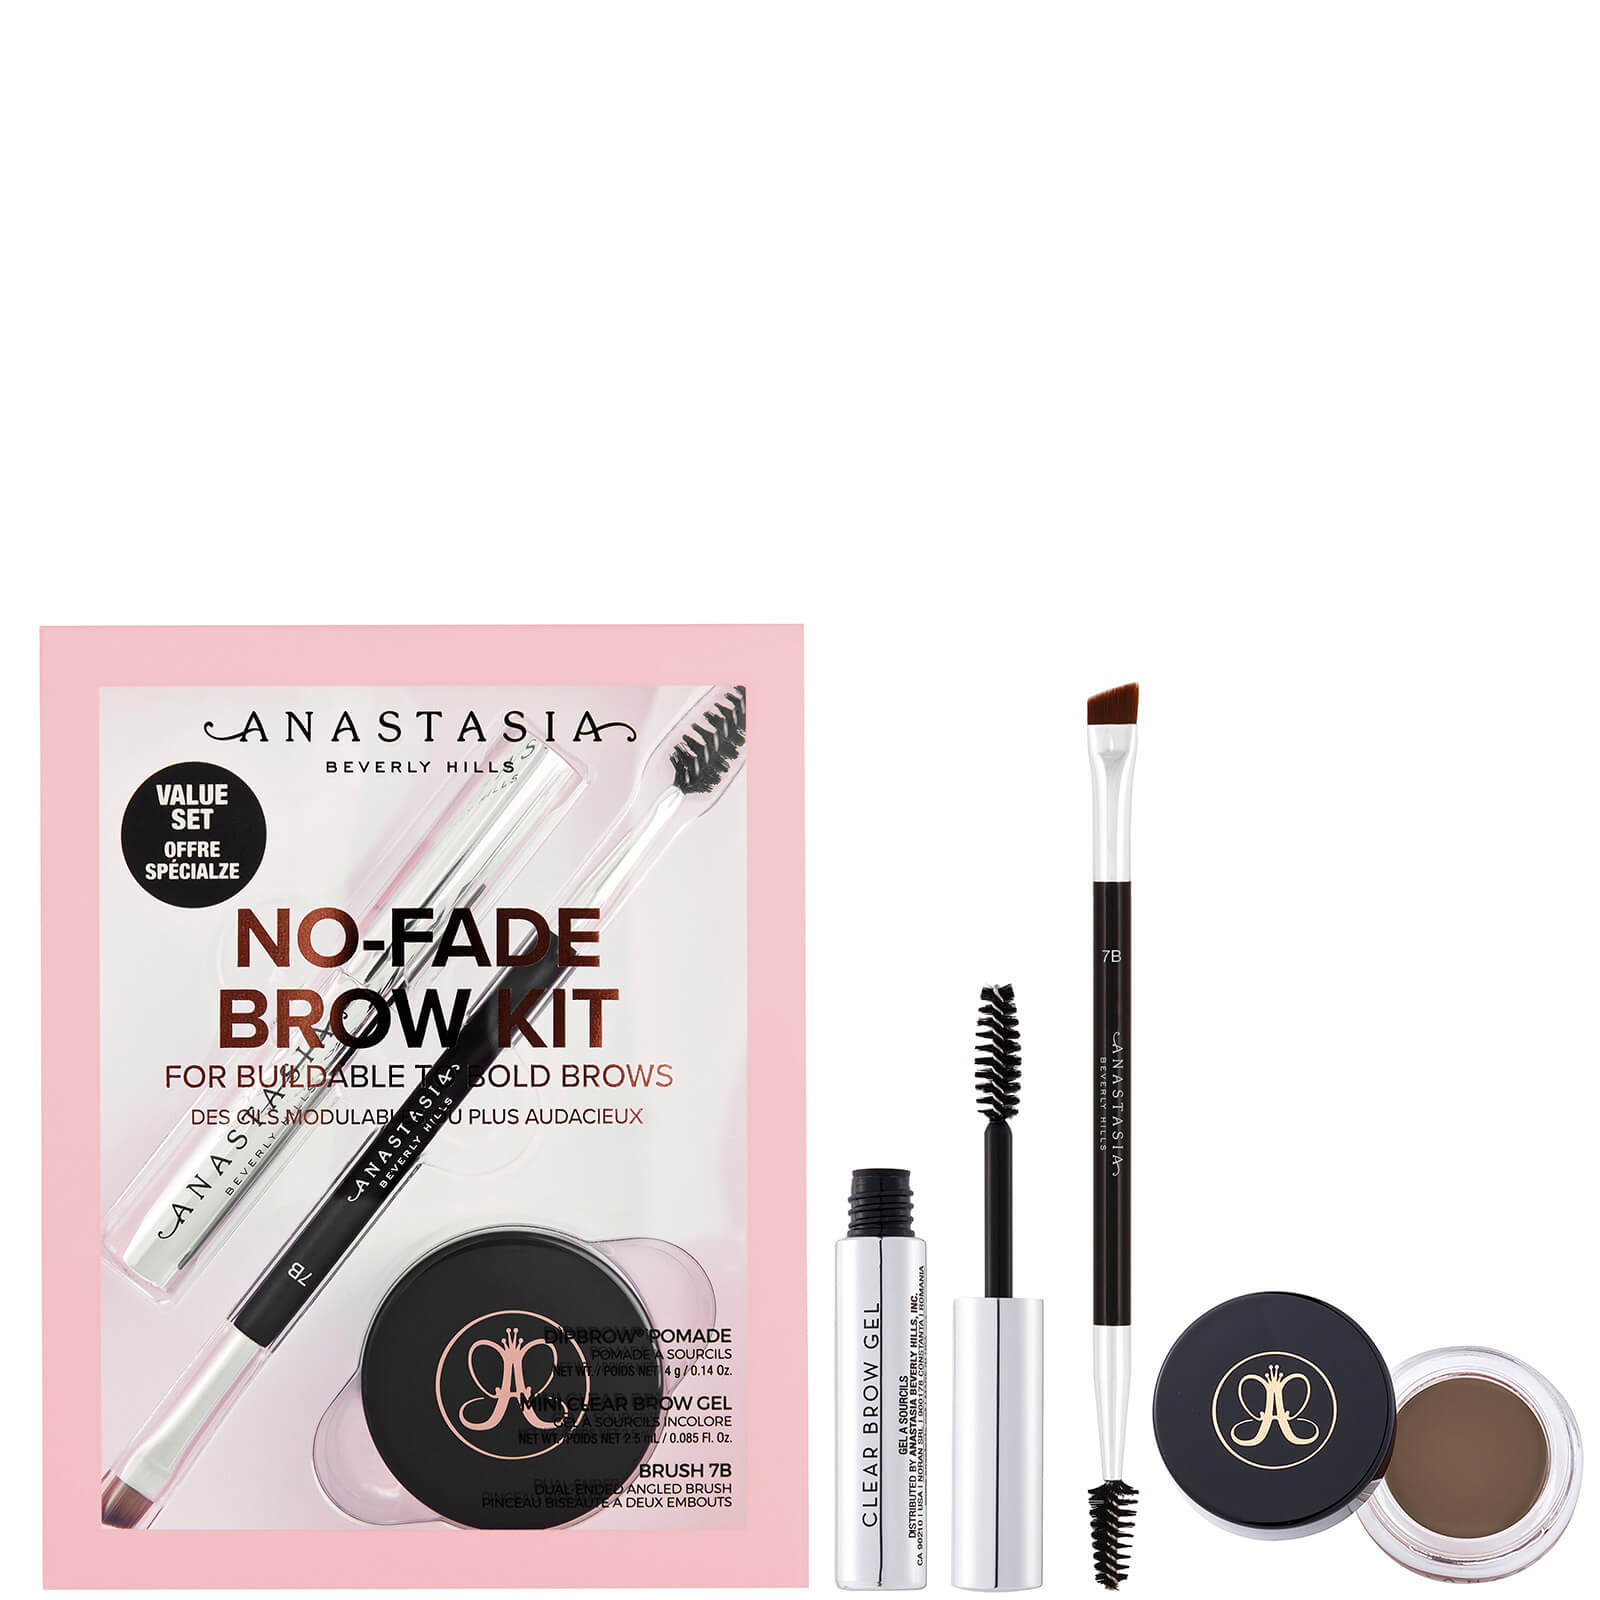 Anastasia Beverly Hills No-Fade Brow Kit 9.5g (Various Shades) - Soft Brown